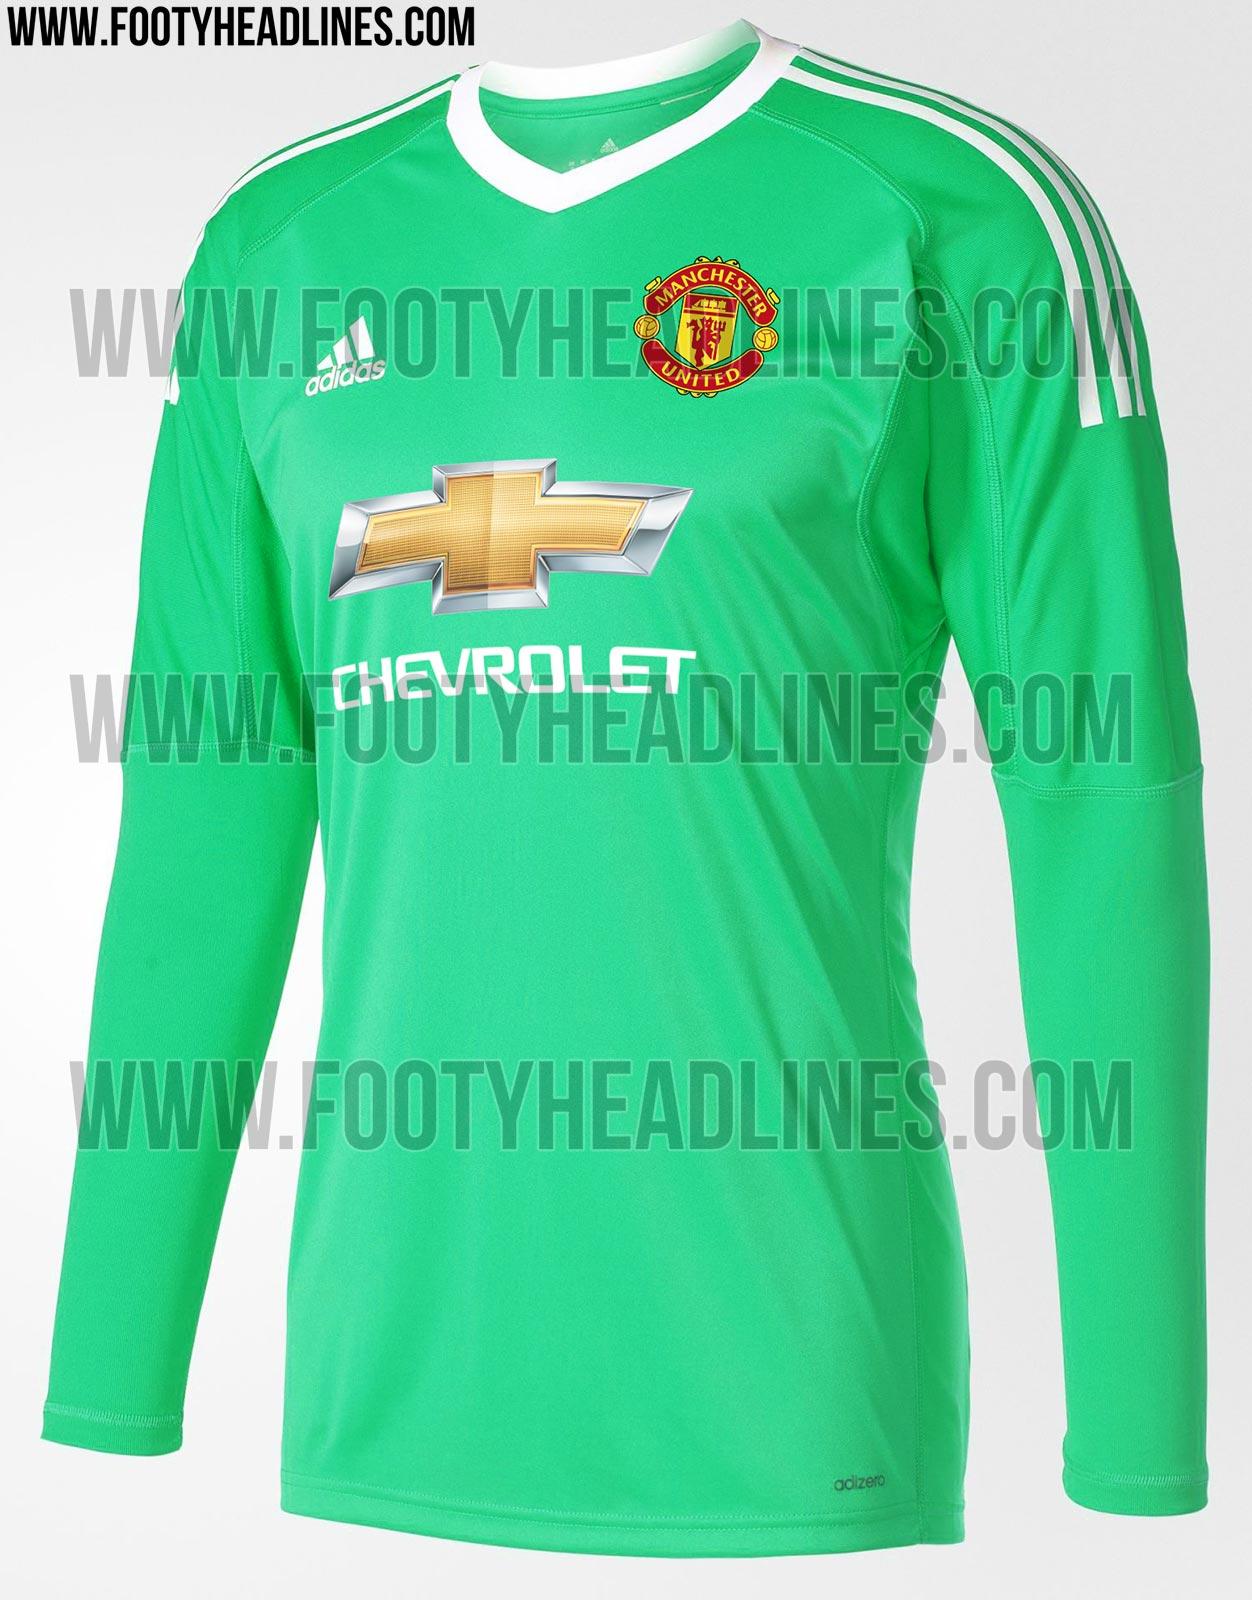 https://4.bp.blogspot.com/-Dbnb9YzeJ3o/WQijpOmchwI/AAAAAAABMHI/oV9kQ5F9alUWP78VYoBxbXyMmTEHatlJACLcB/s1600/manchester-united-17-18-goalkeeper-kit-2.jpg